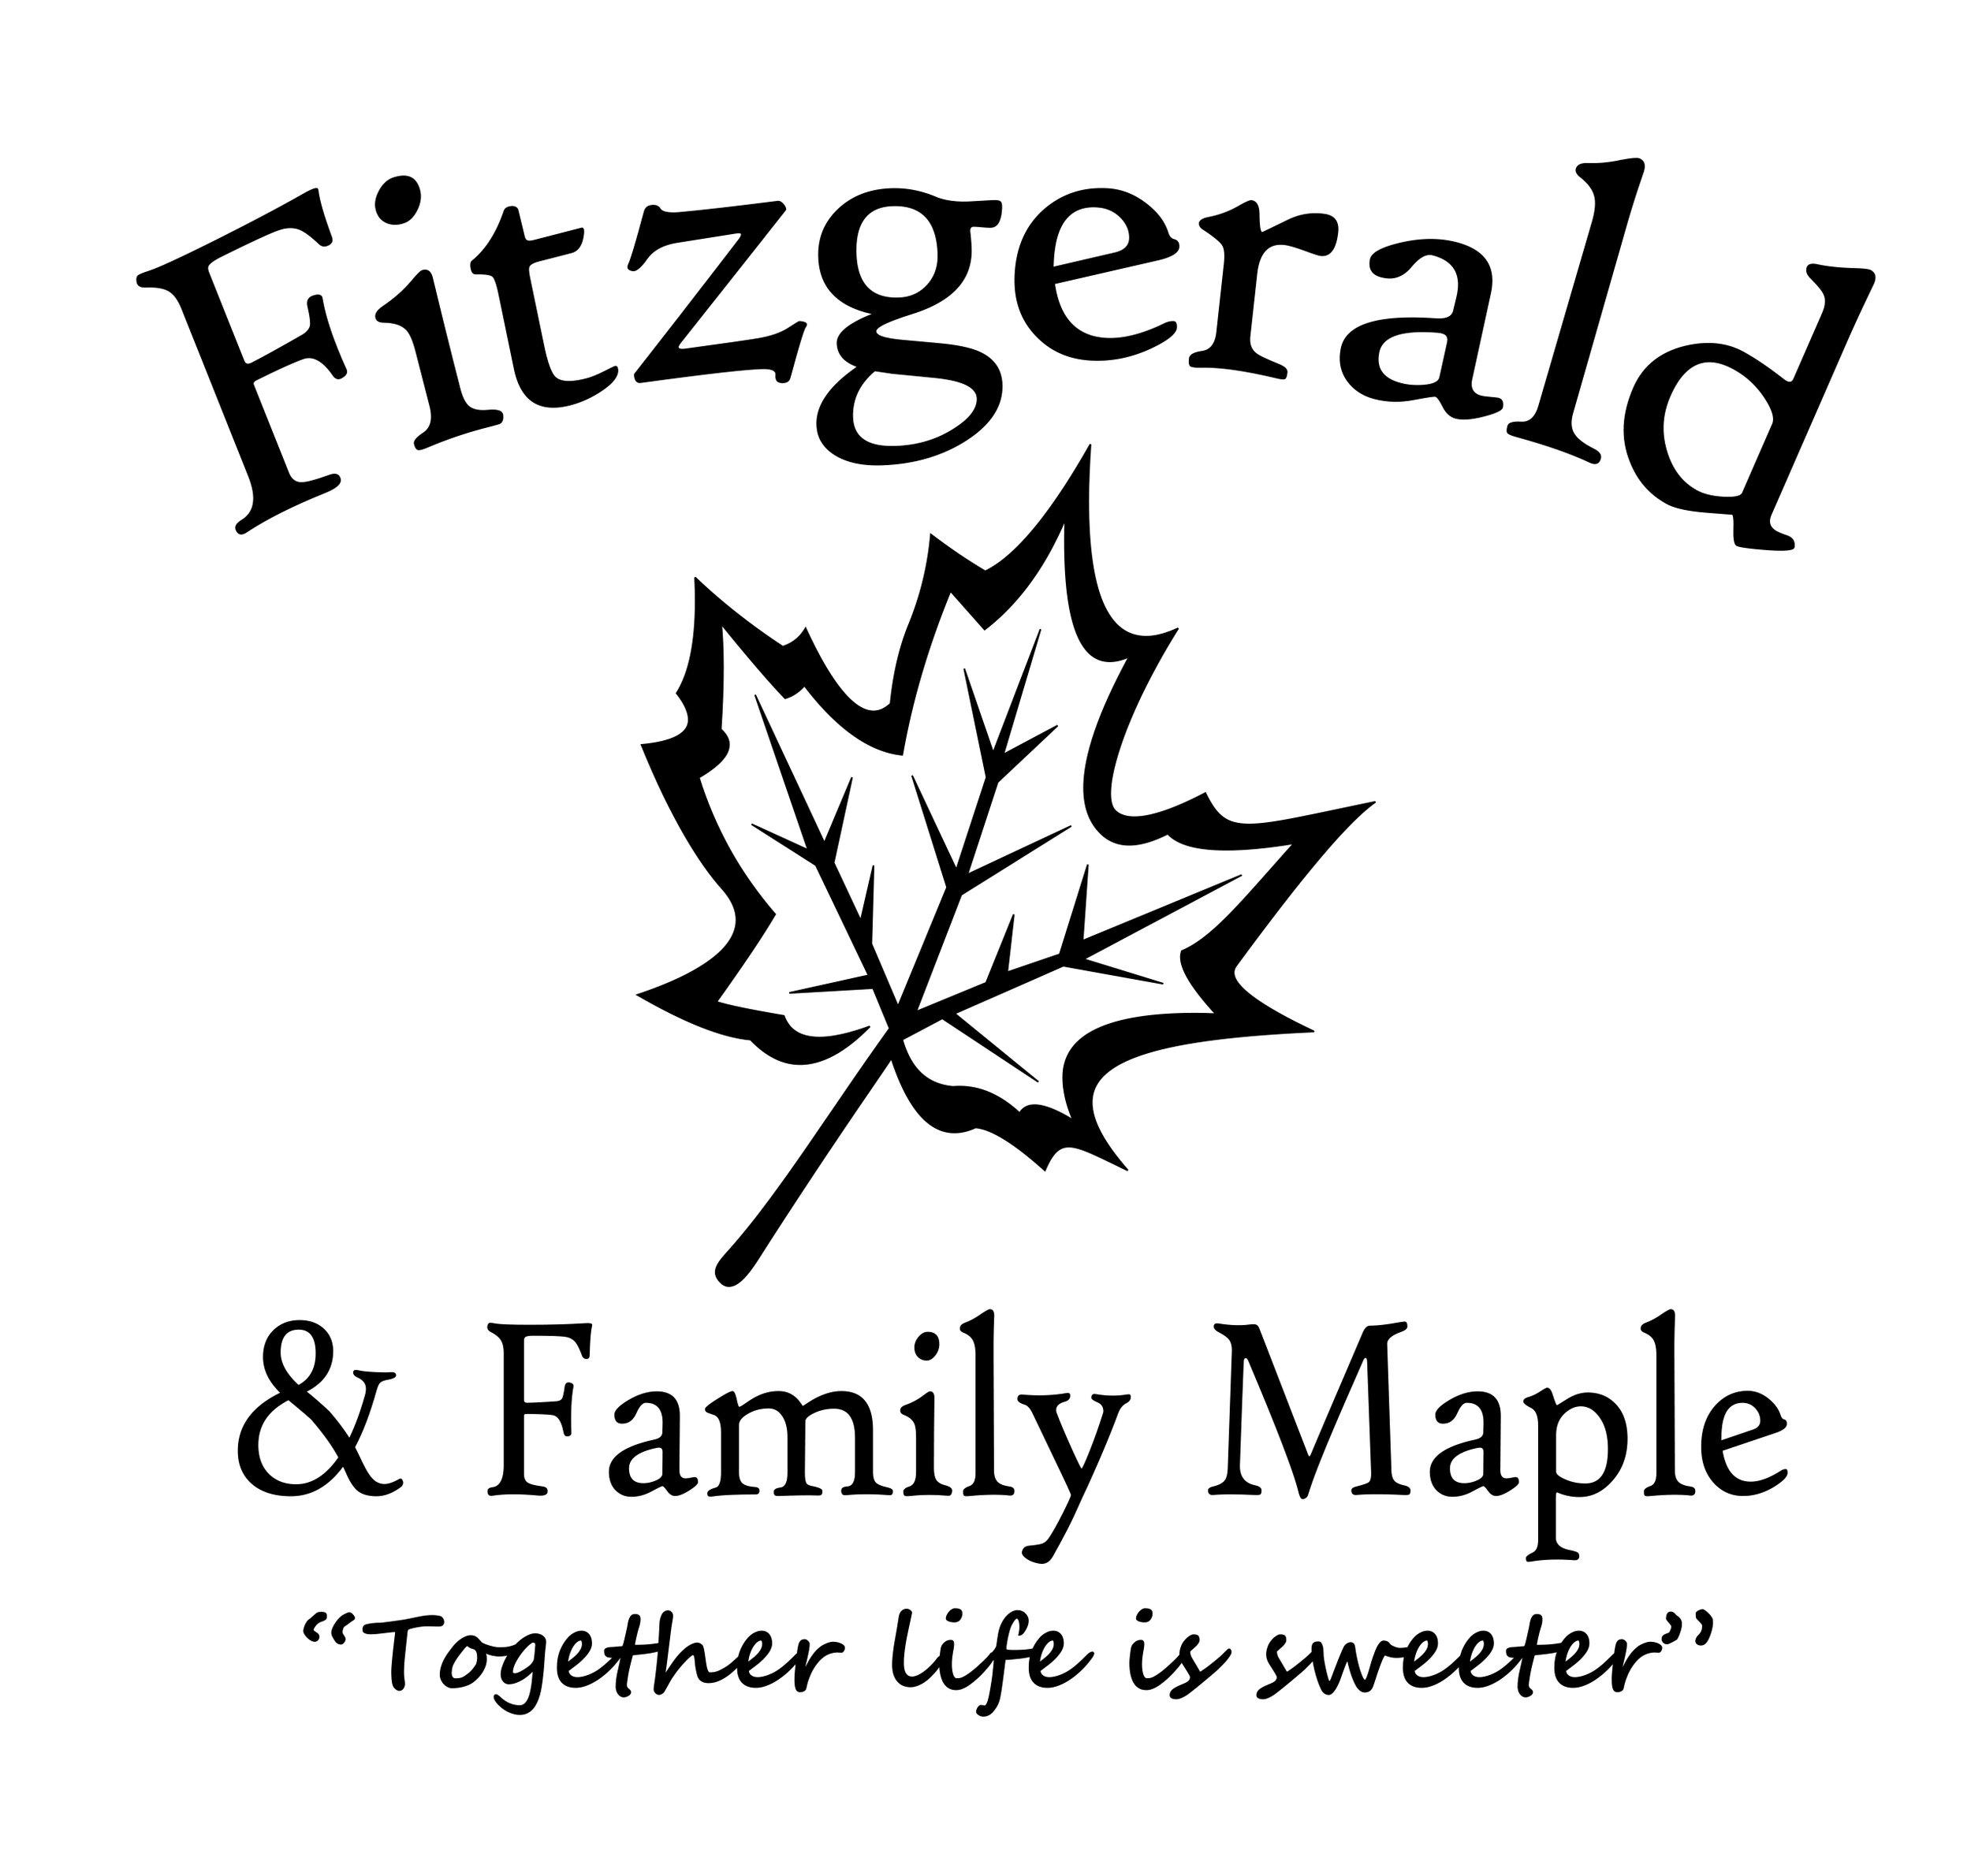 Fitzgerald_FamilyMaple_031114.jpg